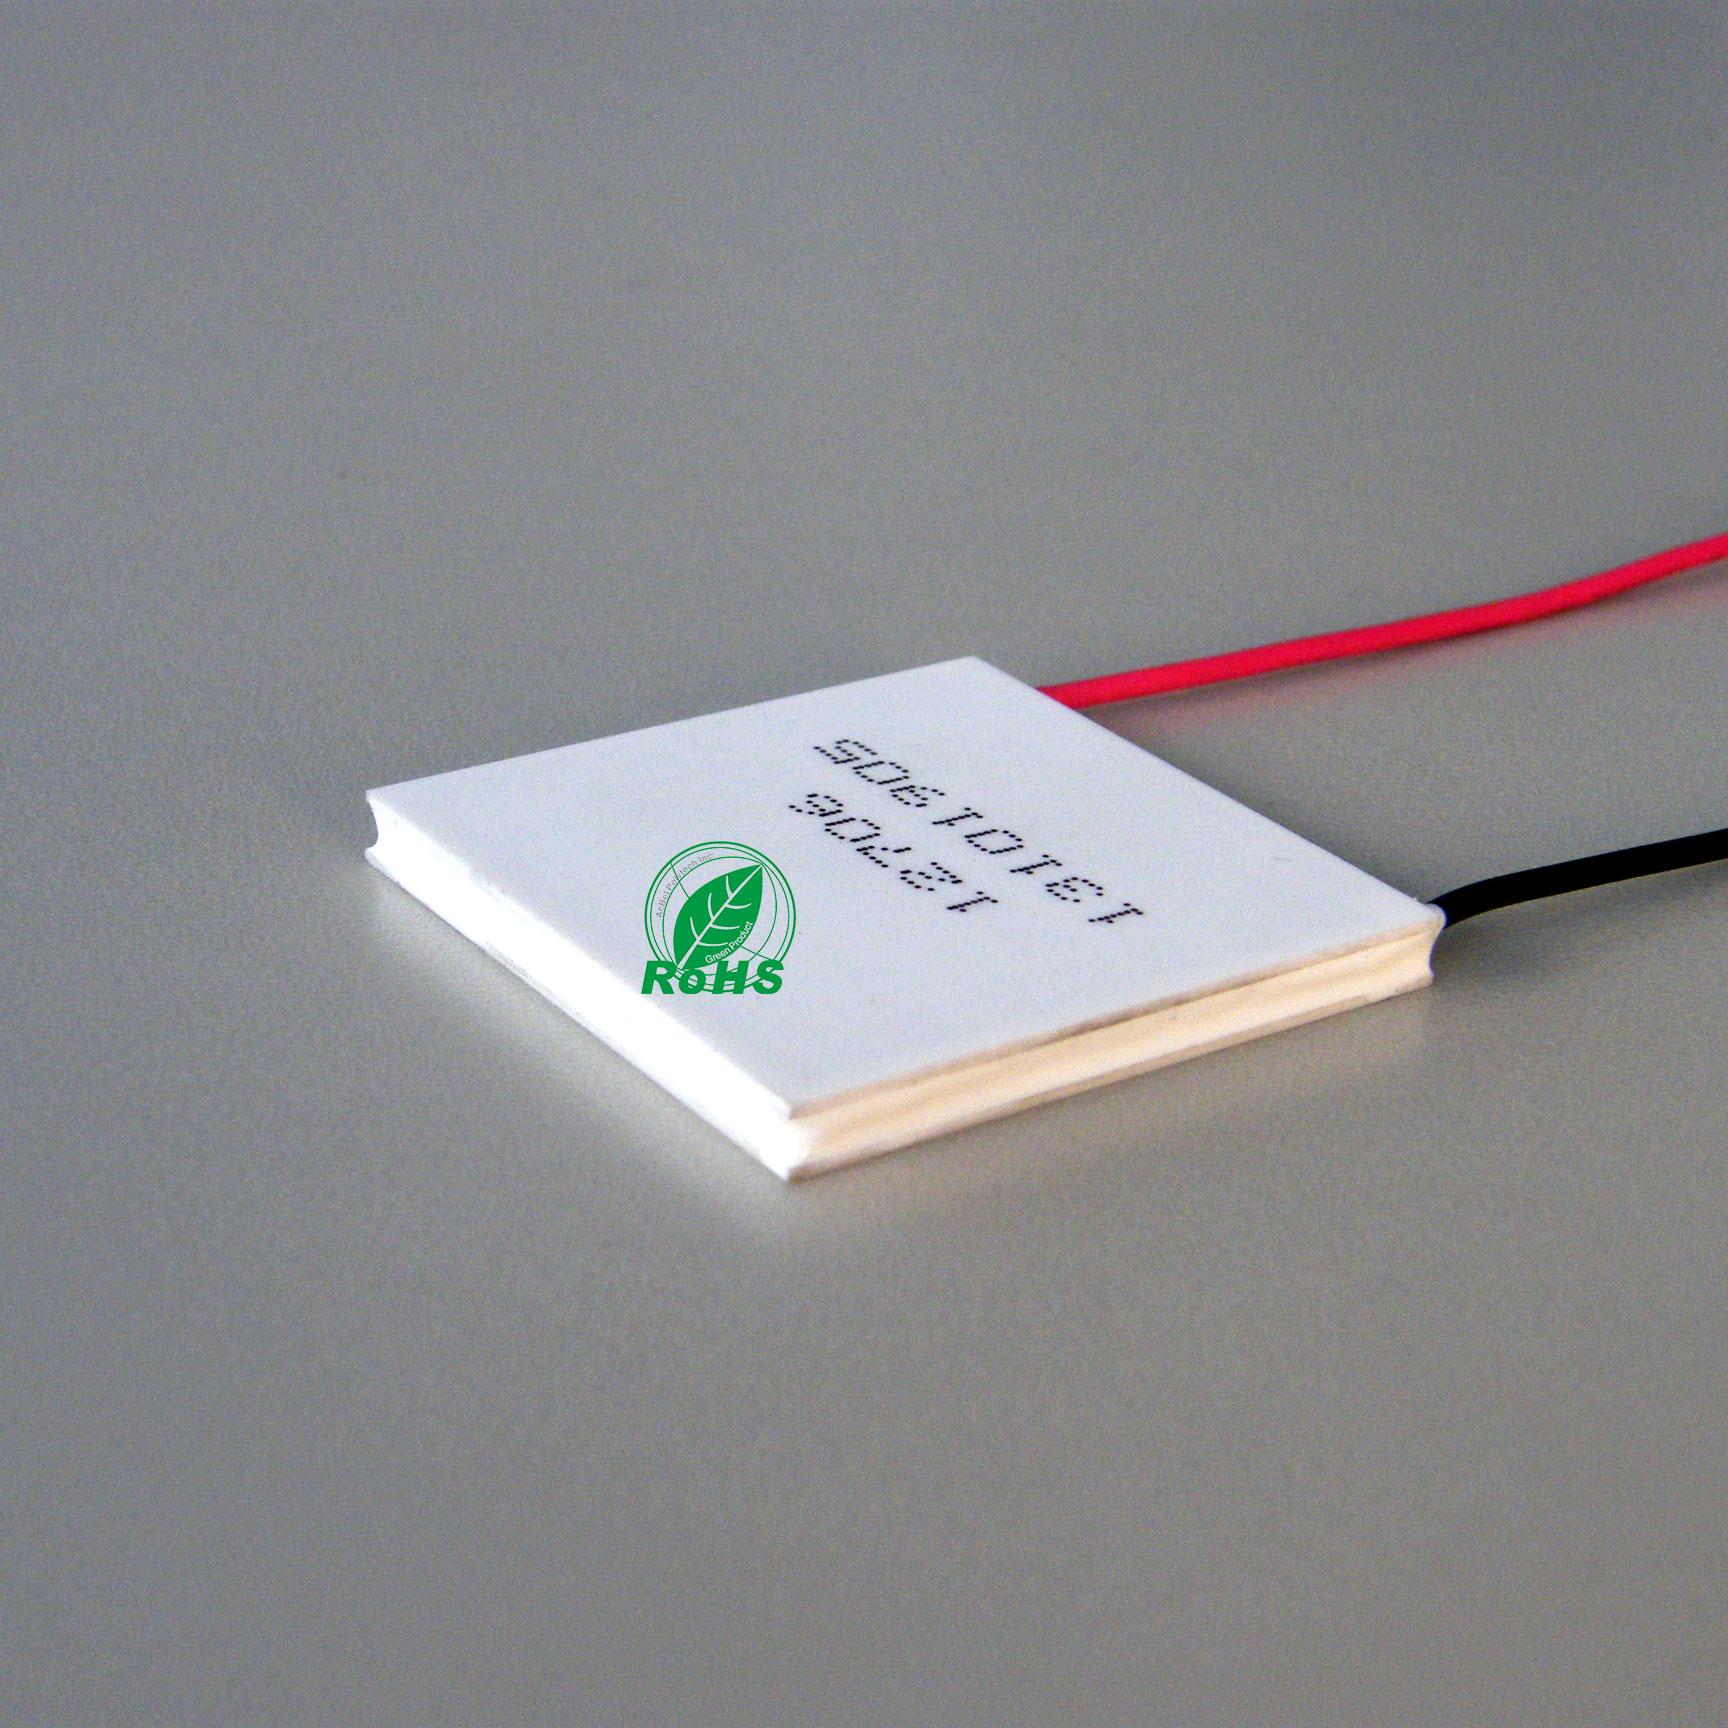 TEC1-12706 30*30mm 12V 60W termoelektrik peltier modülü